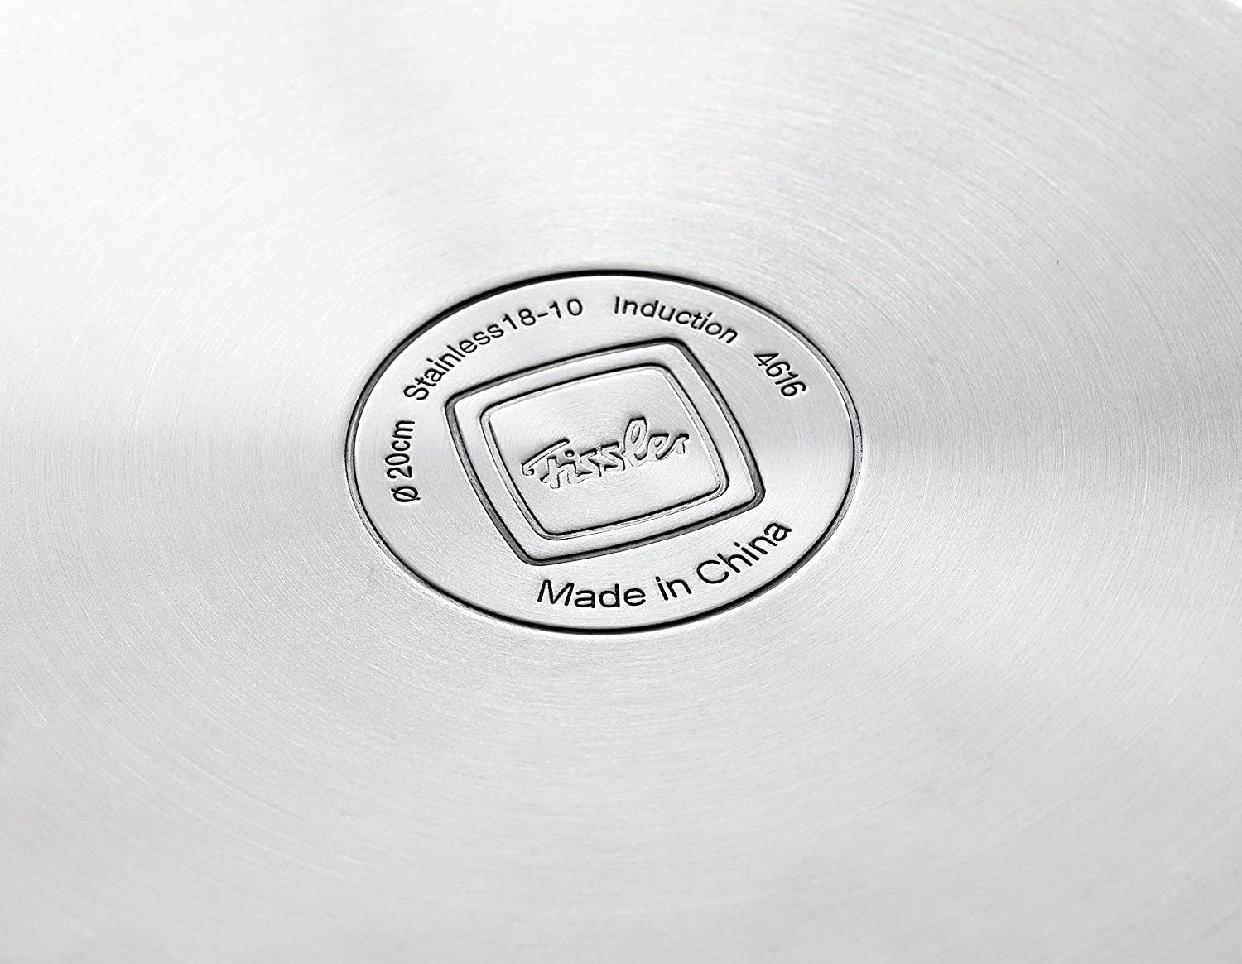 Fissler(フィスラー) ヴィエナセット 5点 082-115-05-002の商品画像5